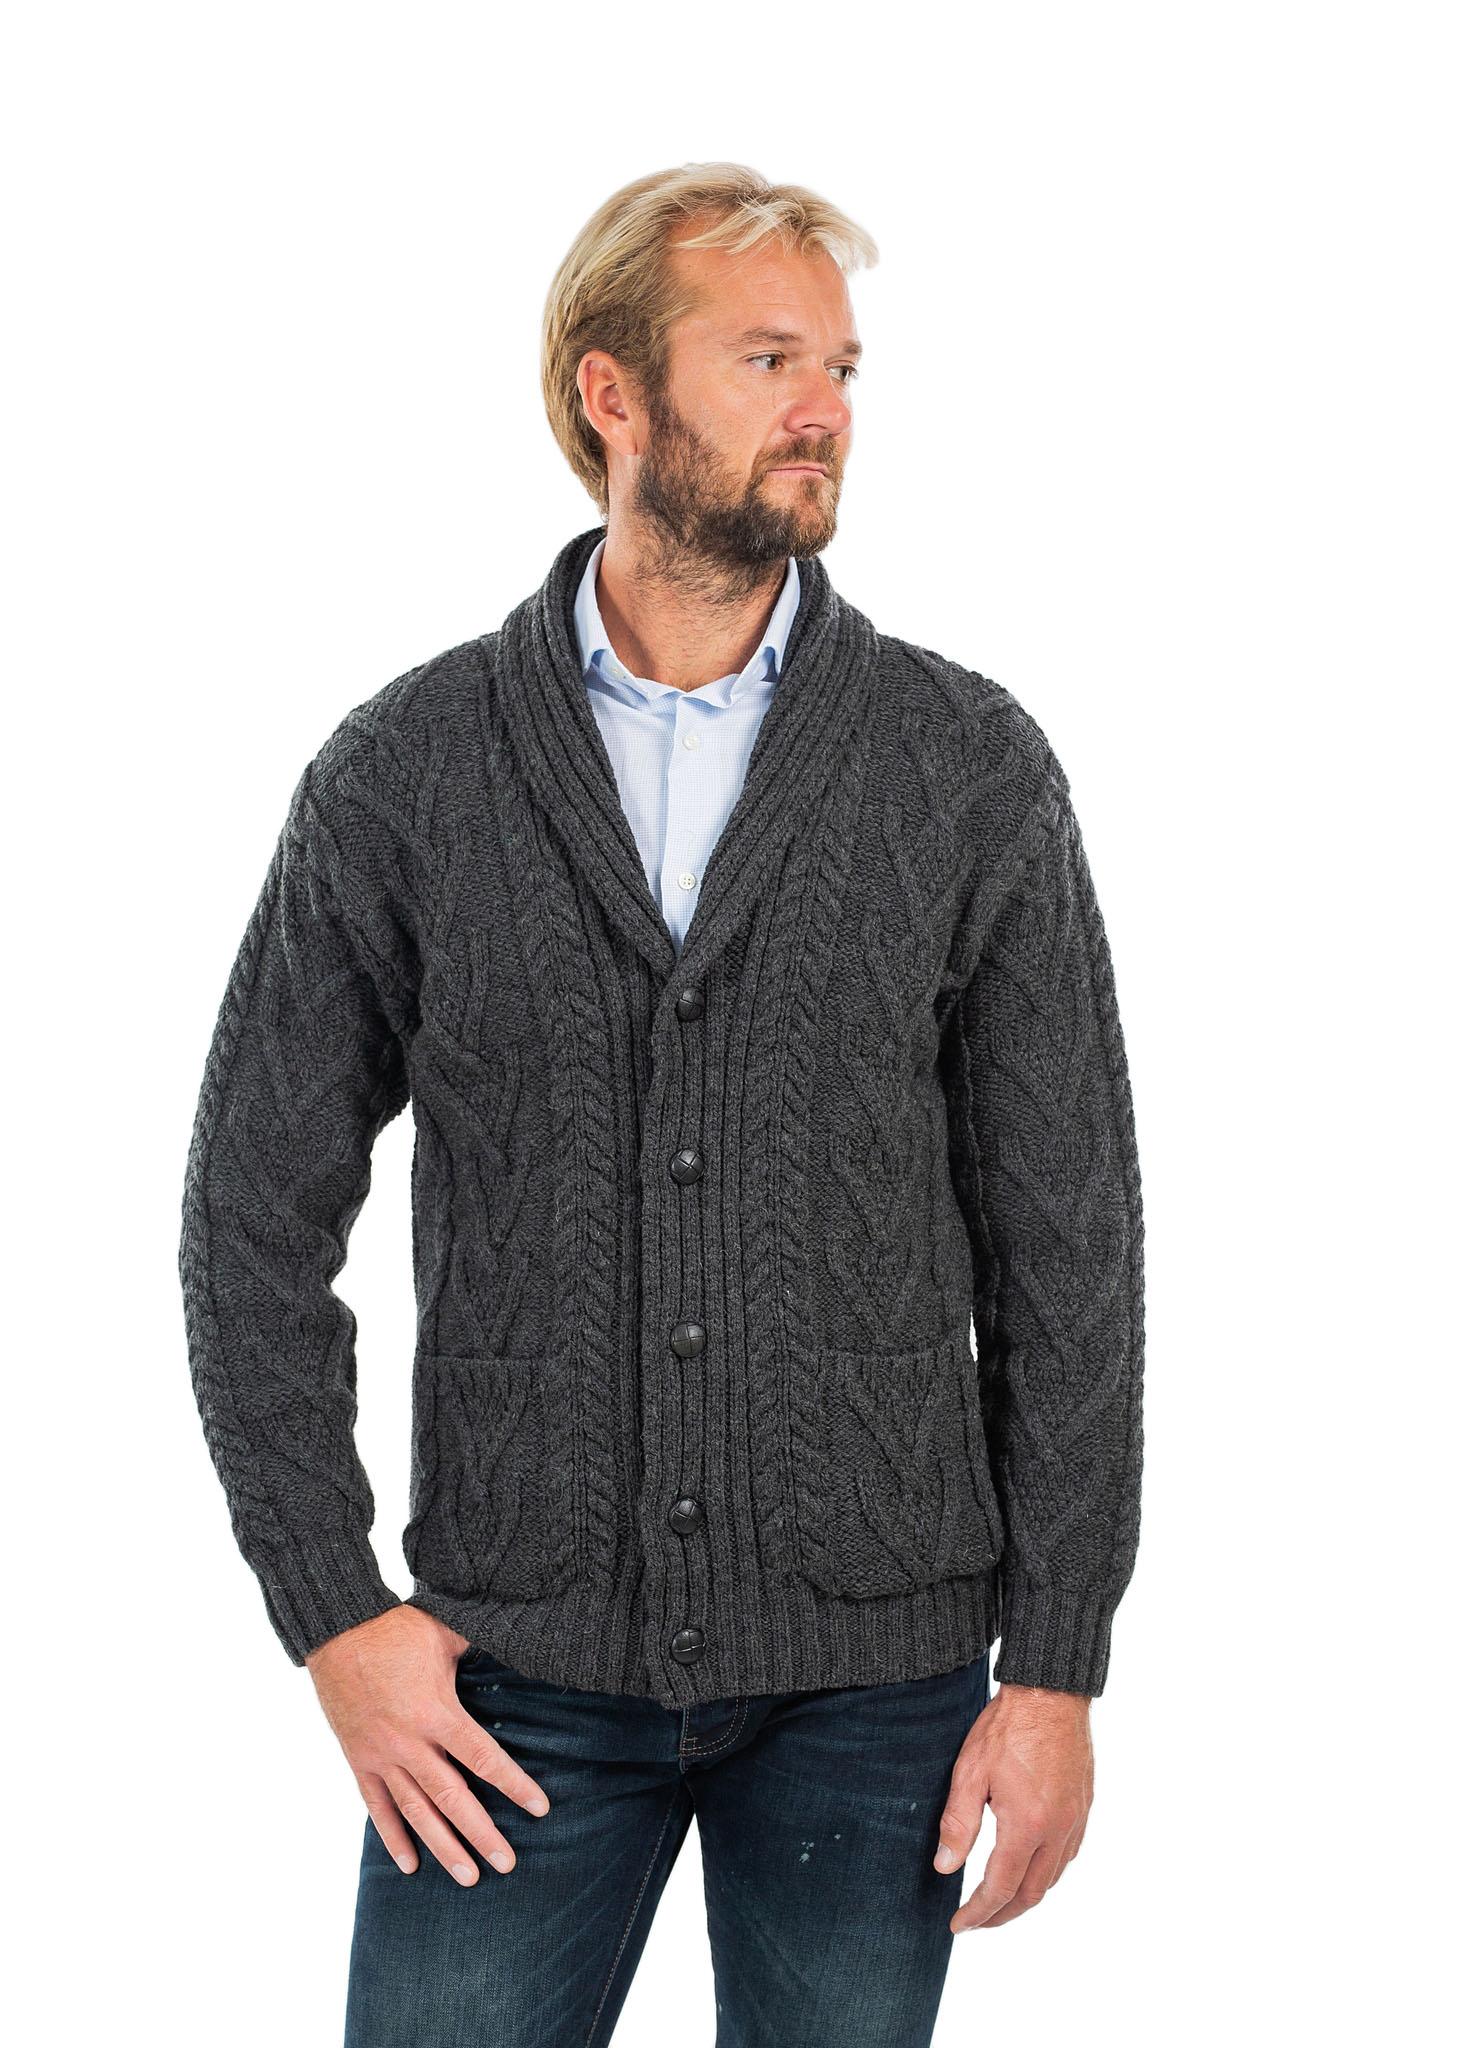 SAOL-Mens-Irish-Merino-Wool-Cardigan-Shawl-Collar-Front-Pockets-Aran-Cable-Knit thumbnail 36